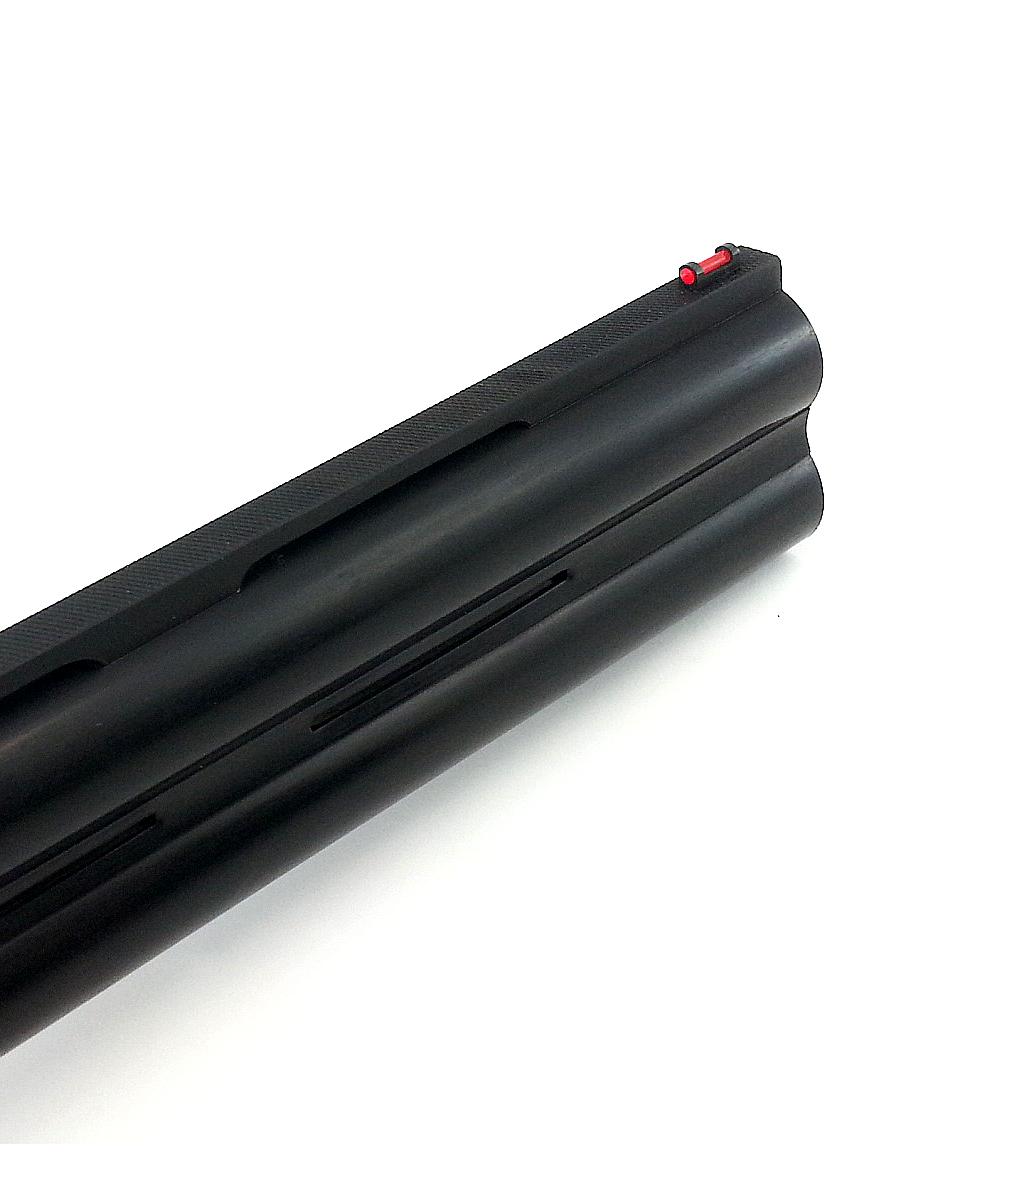 Kral Arms X01 Over-Under 12 Gauge Shotgun 28 Inch Barrel